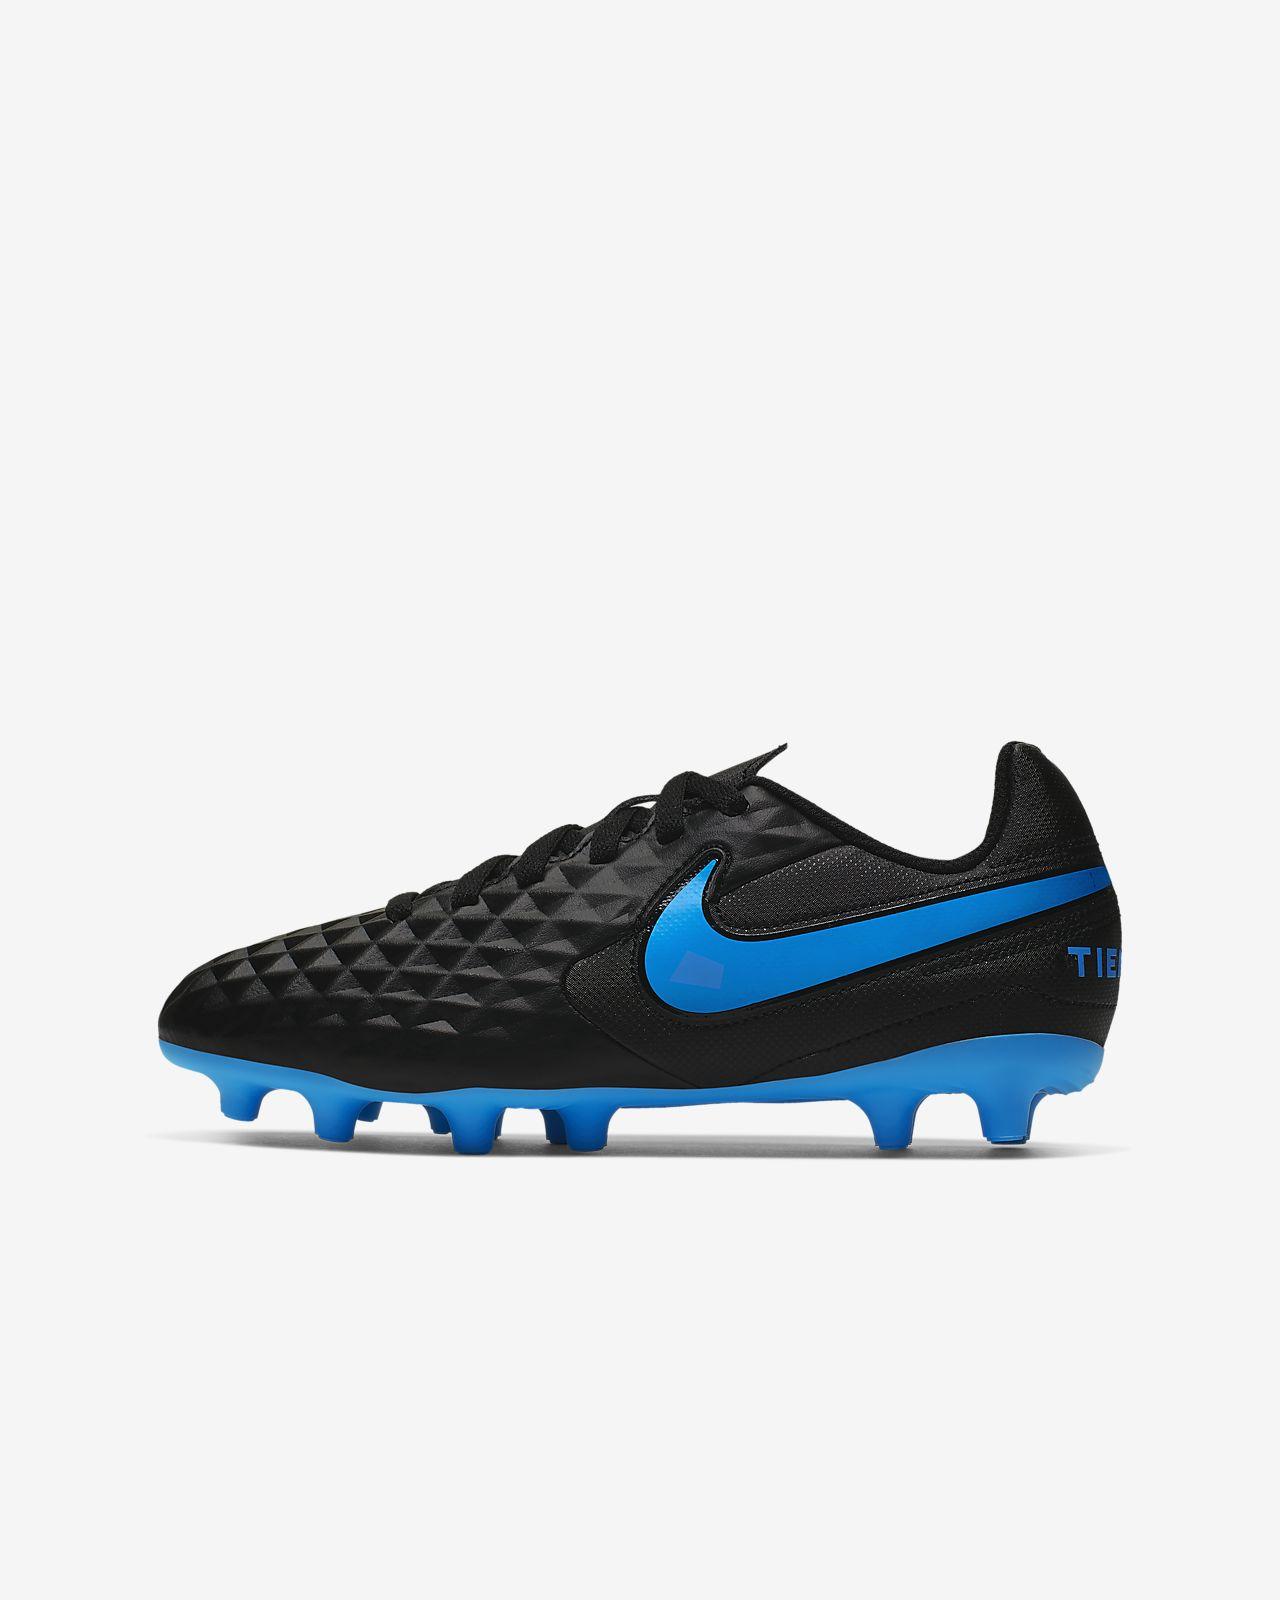 0a8280a8cc Nike Jr. Tiempo Legend 8 Club MG Big Kids' Multi-Ground Soccer Cleat